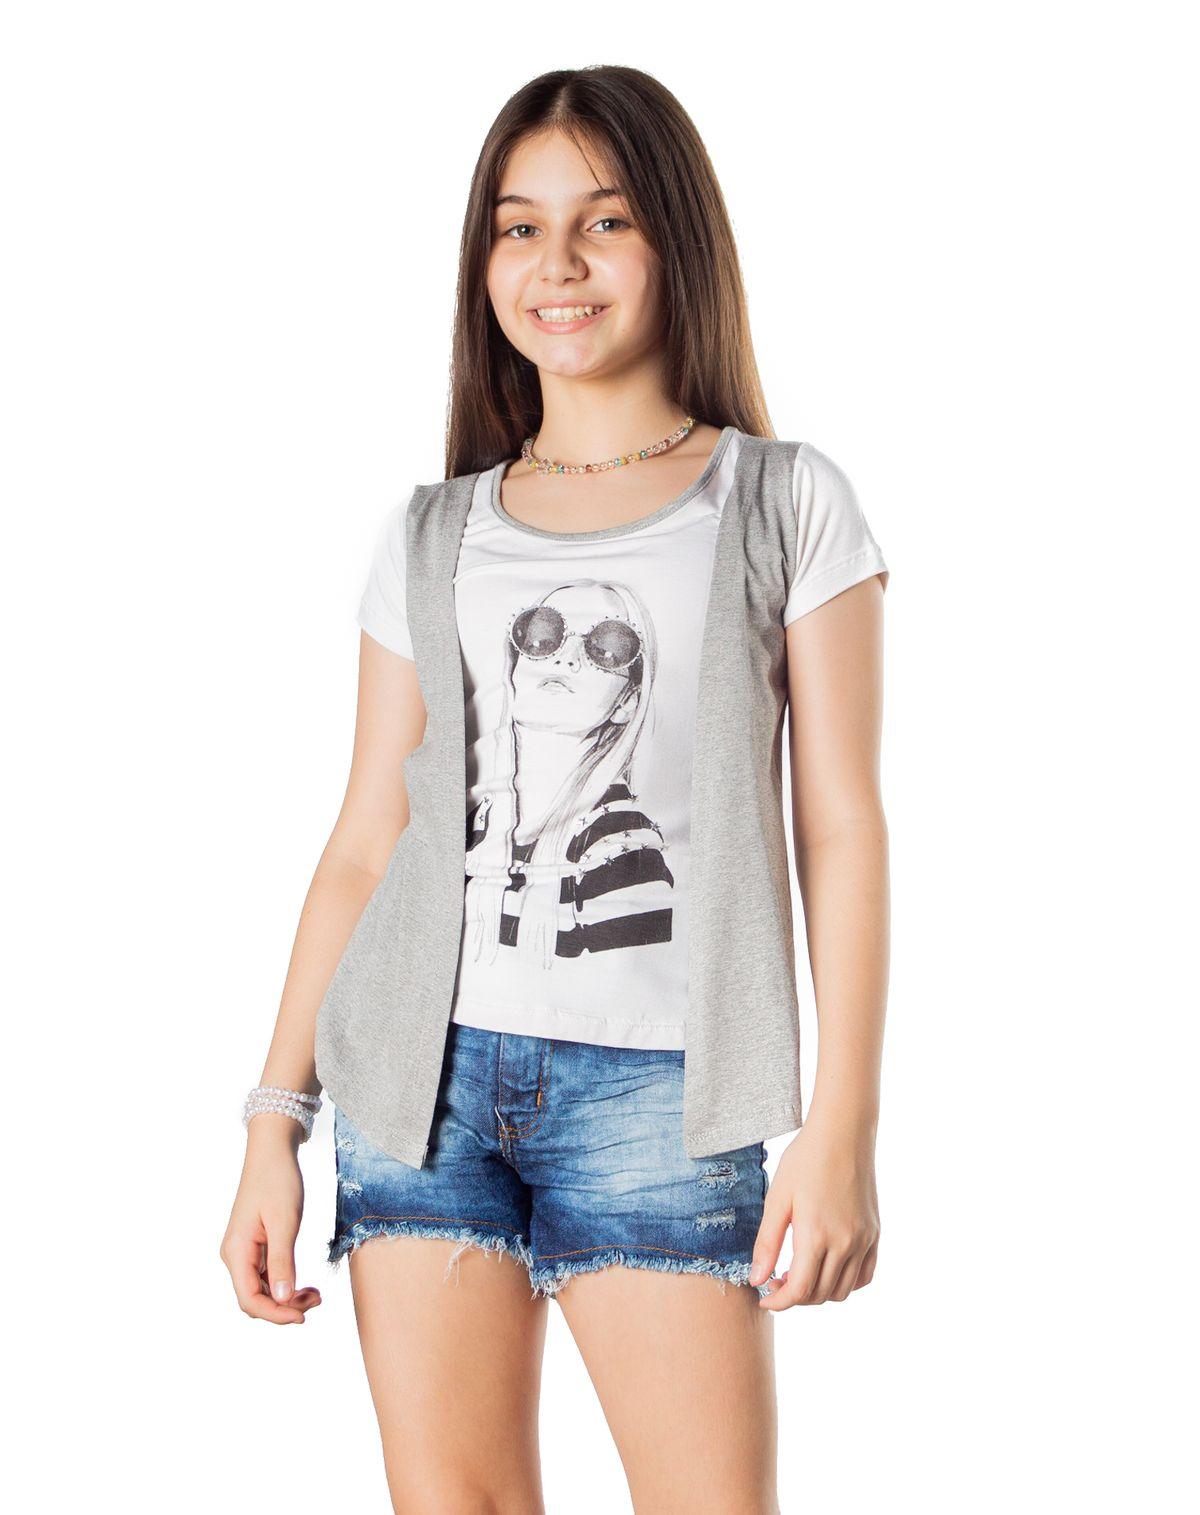 559693011-blusa-manga-curta-juvenil-sobreposicao-estampada-strass-mescla-14-7ea